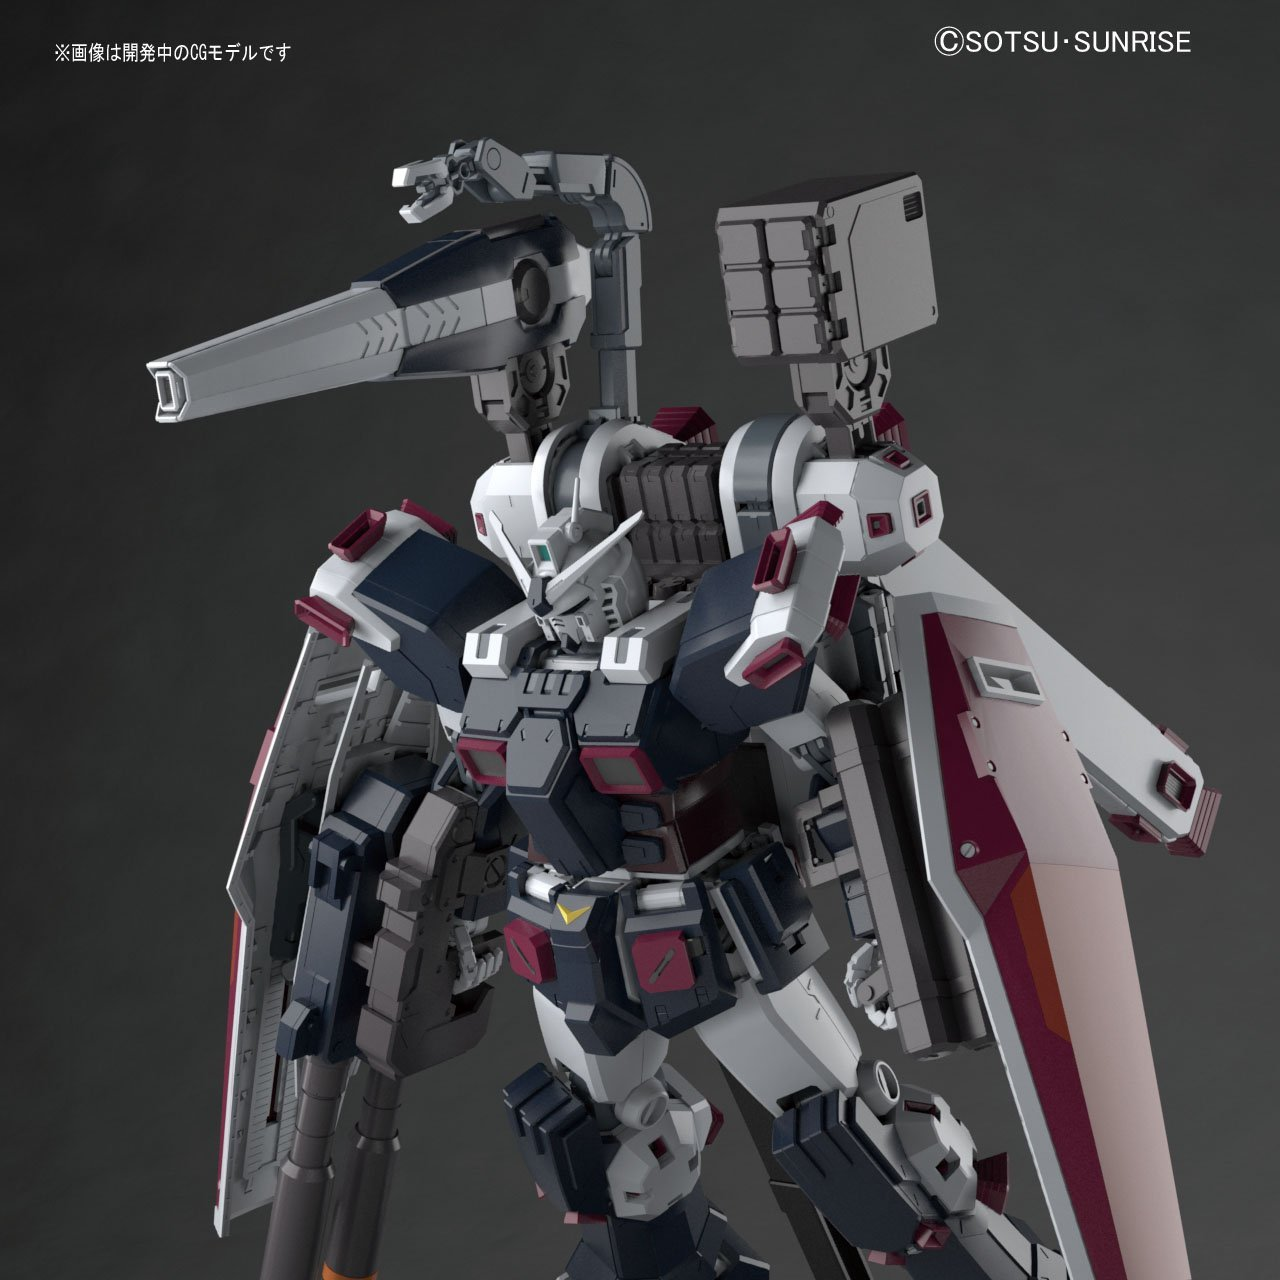 MG 1/100『フルアーマー・ガンダム Ver.Ka(GUNDAM THUNDERBOLT版)』機動戦士ガンダム サンダーボルト プラモデル-009